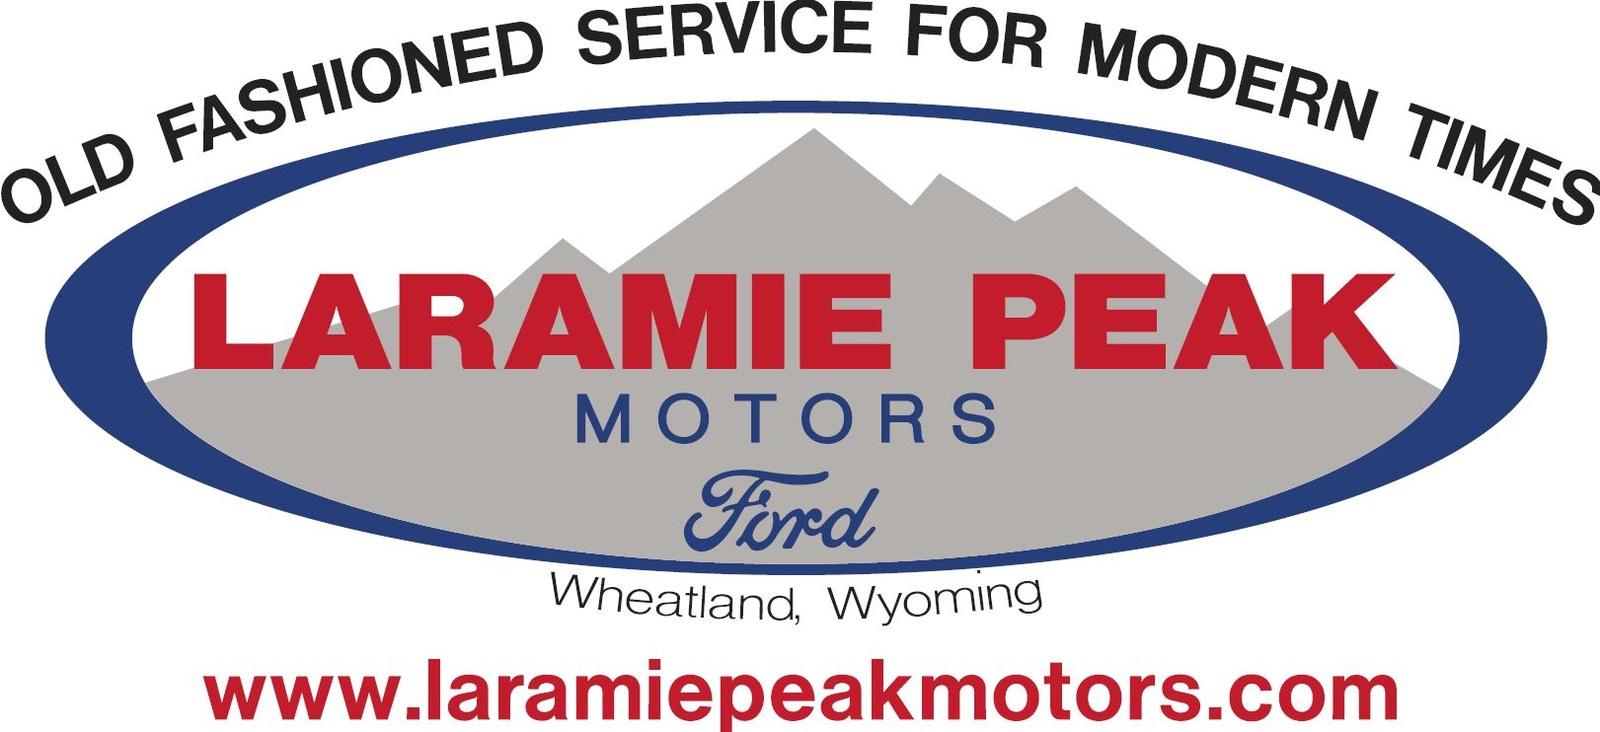 laramie peak motors wheatland wy read consumer reviews On laramie peak motors wheatland wy